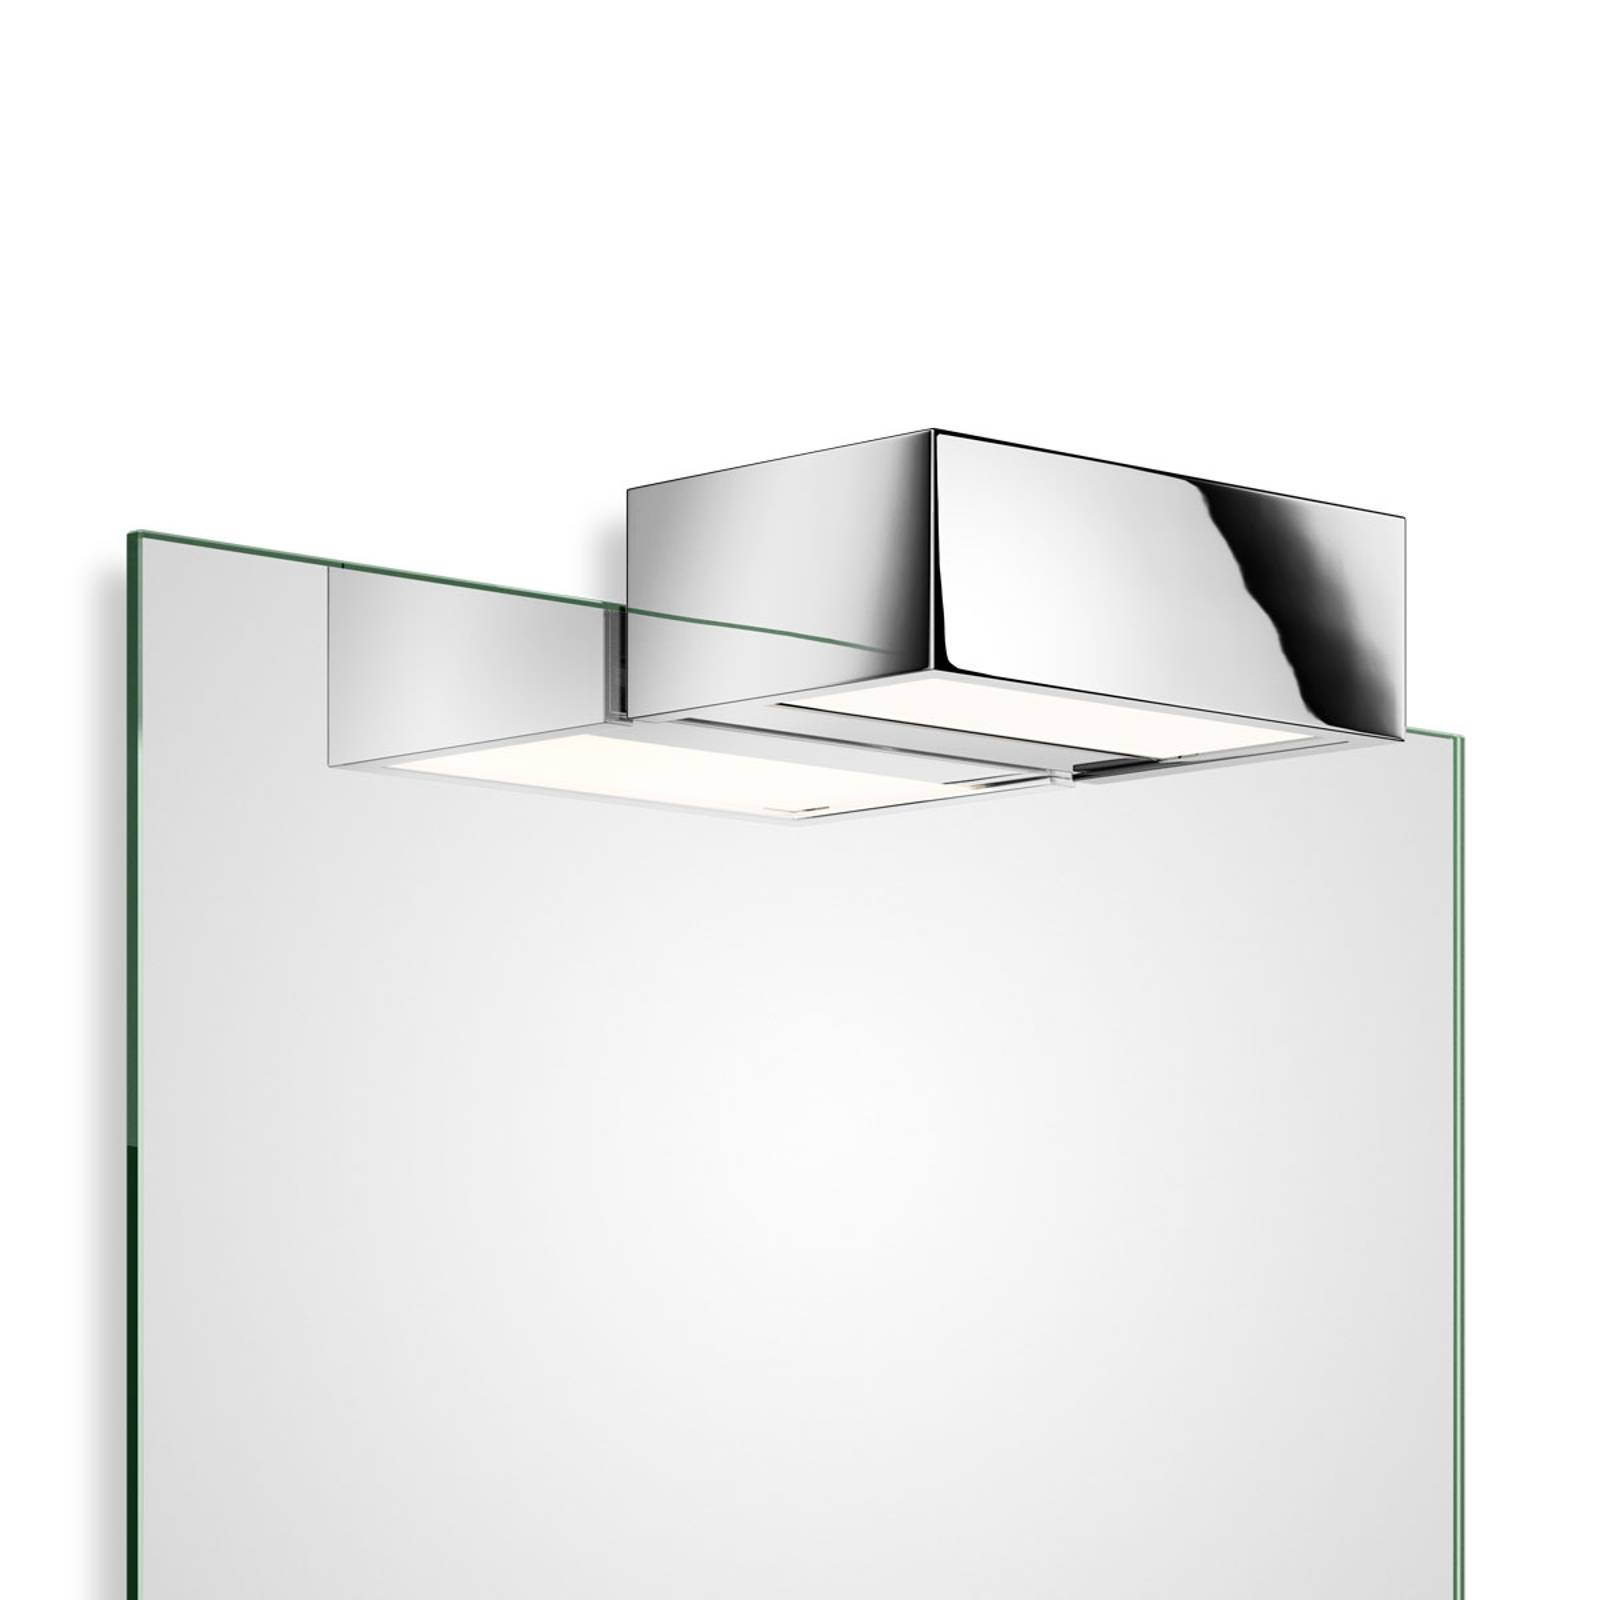 Decor Walther Box 1-15 N -LED-peililamppu 3 000 K